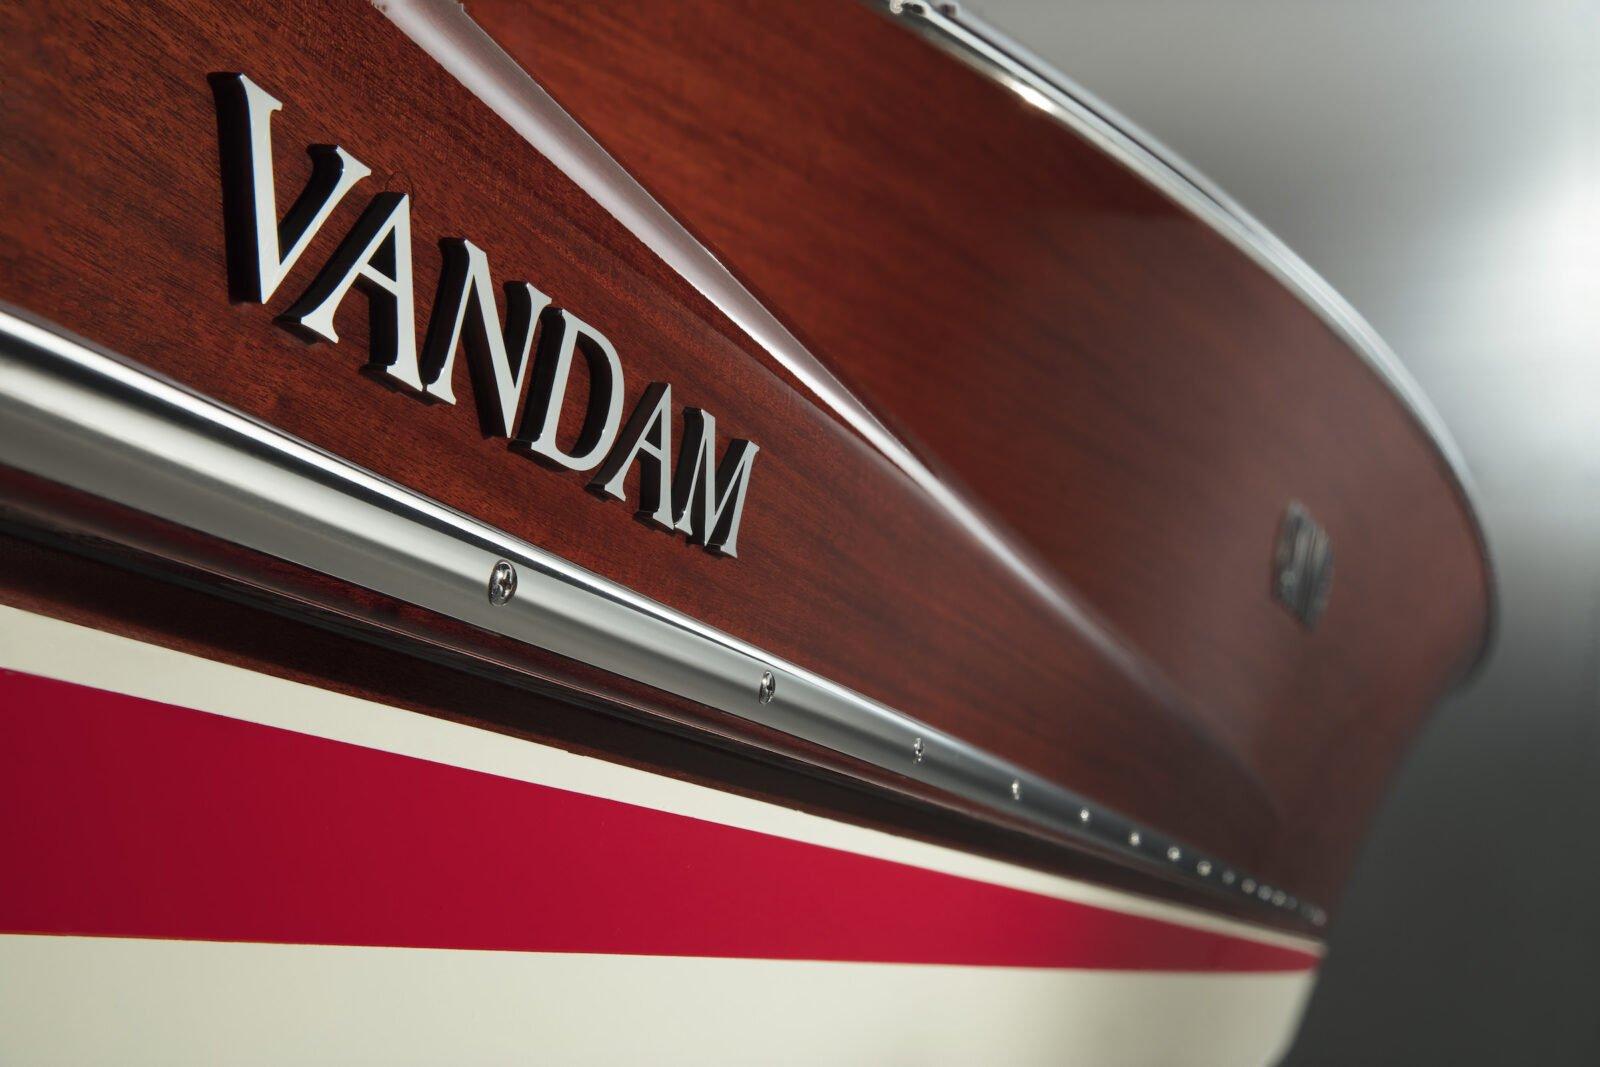 Van Dam Catnip Boat 2 1600x1067 - Van Dam Catnip